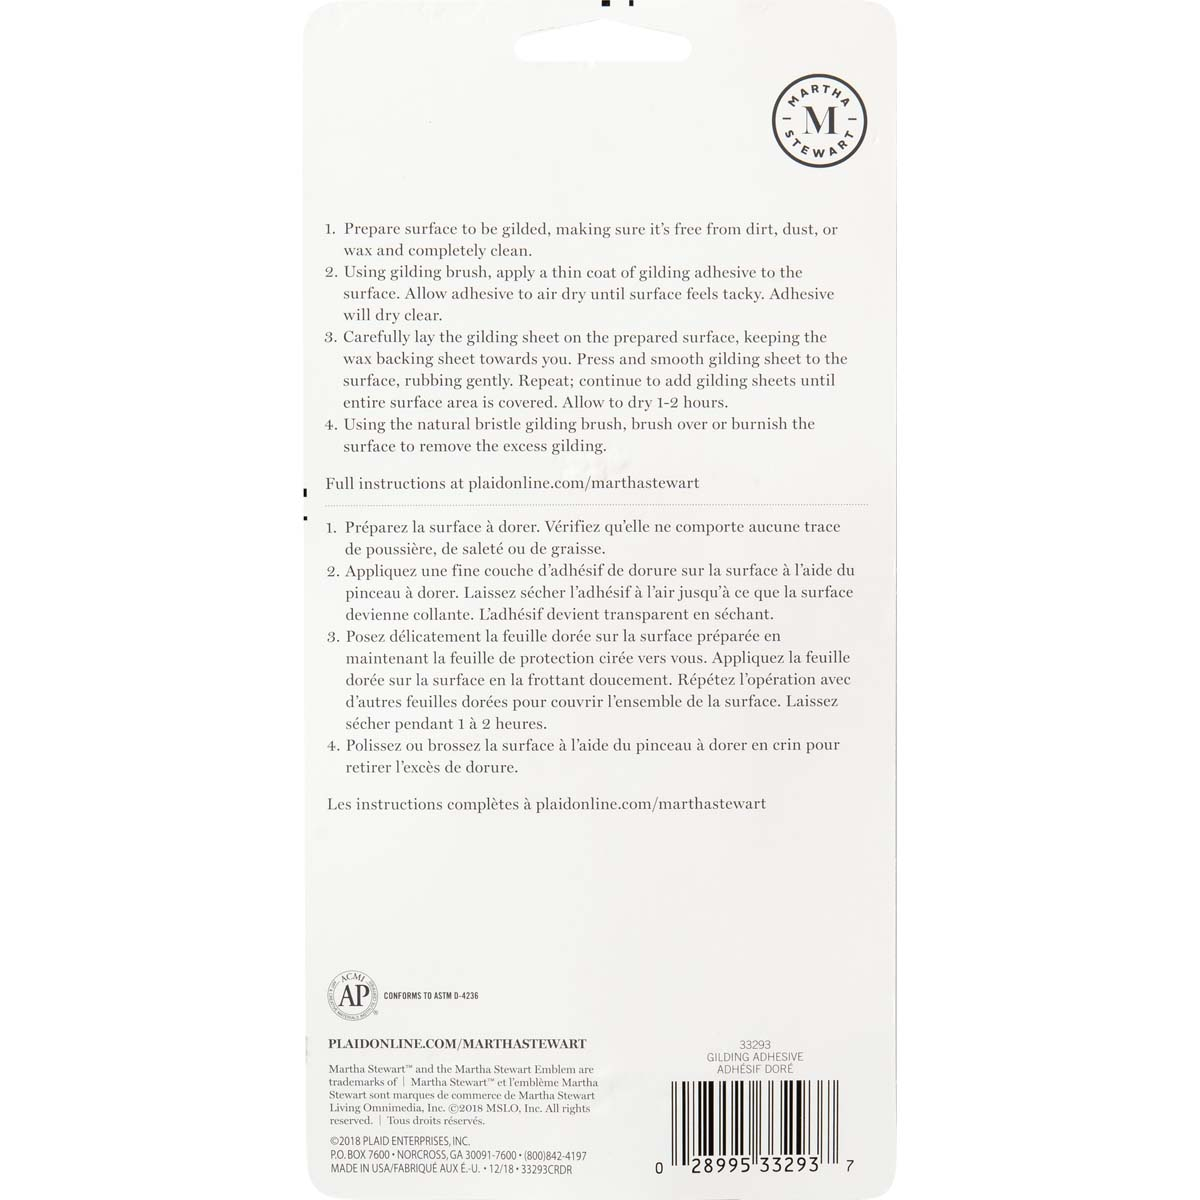 Martha Stewart ® Gilding Adhesive, 2 oz. - 33293